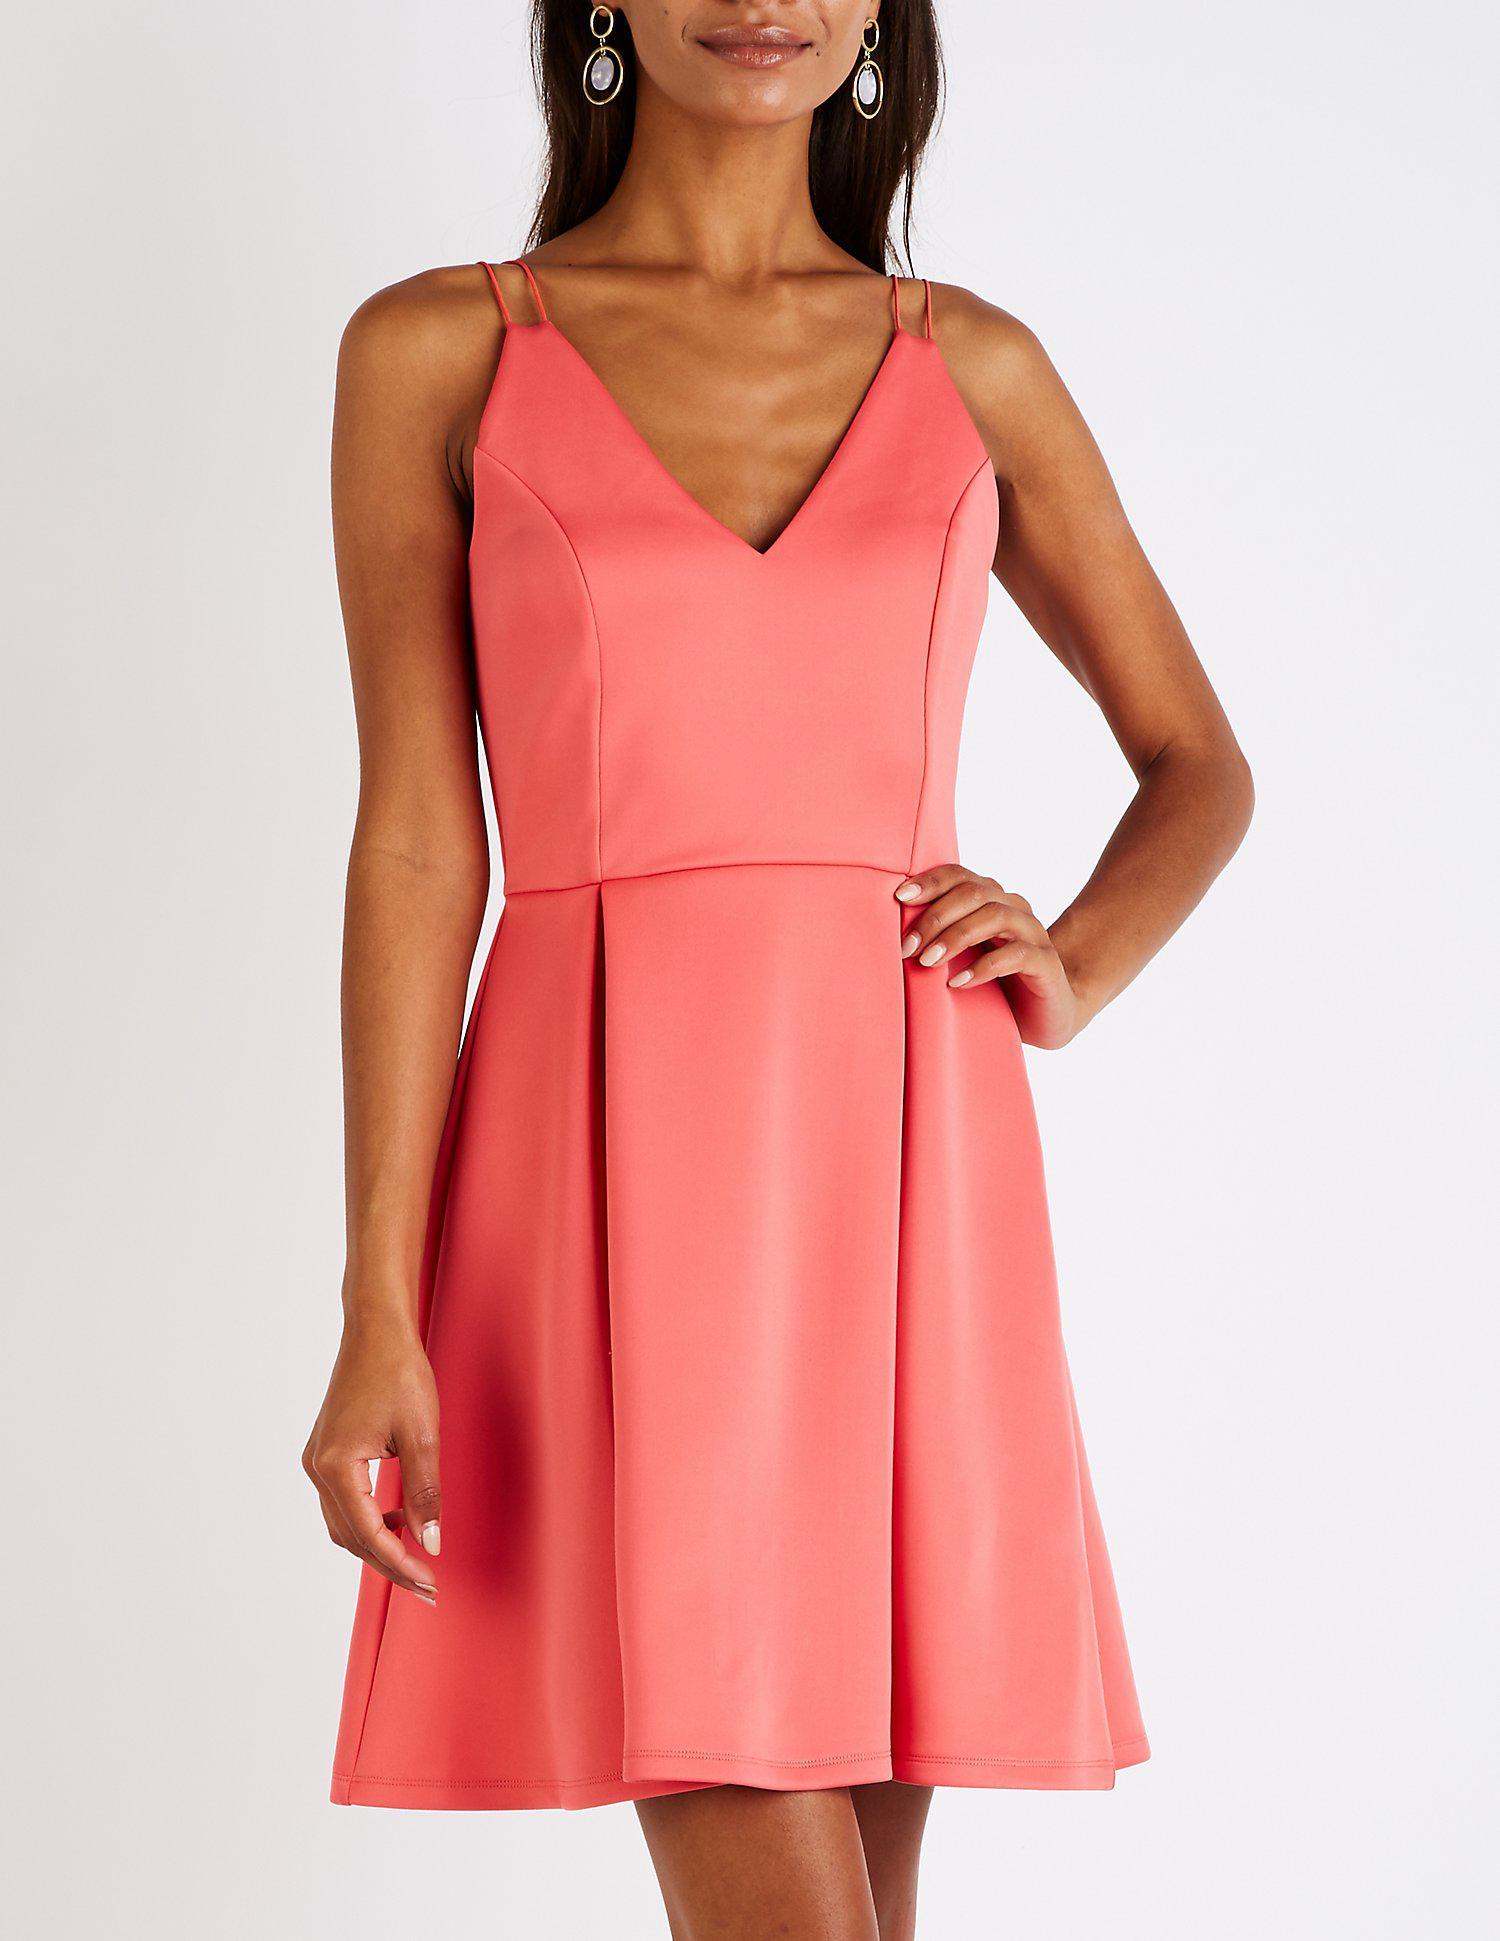 6b1a52a4d1 Lyst - Charlotte Russe V Neck Skater Dress in Pink